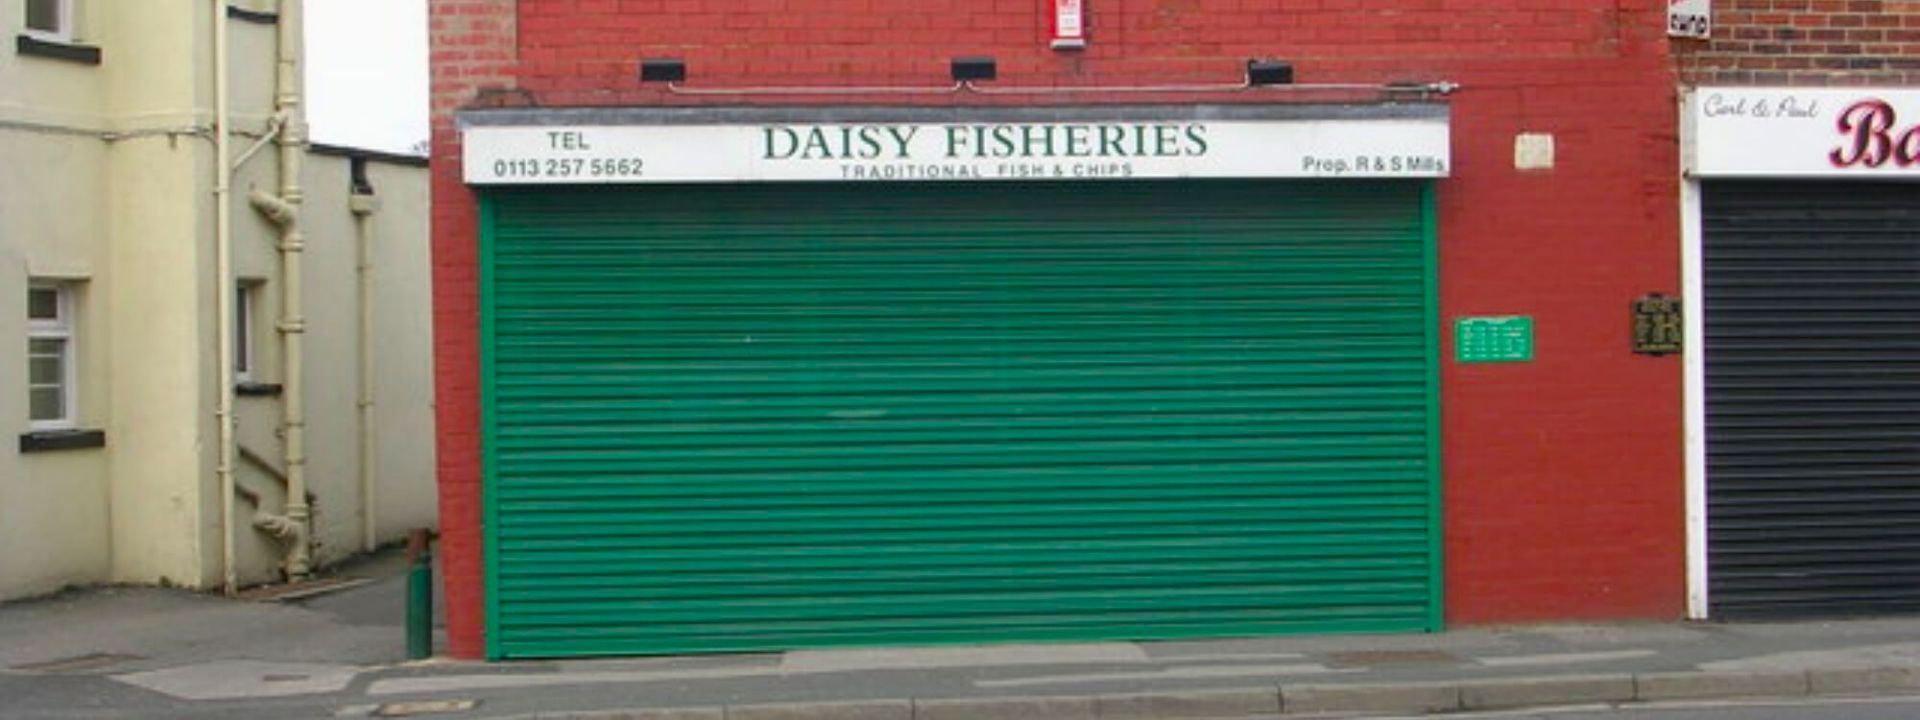 Daisy Fisheries